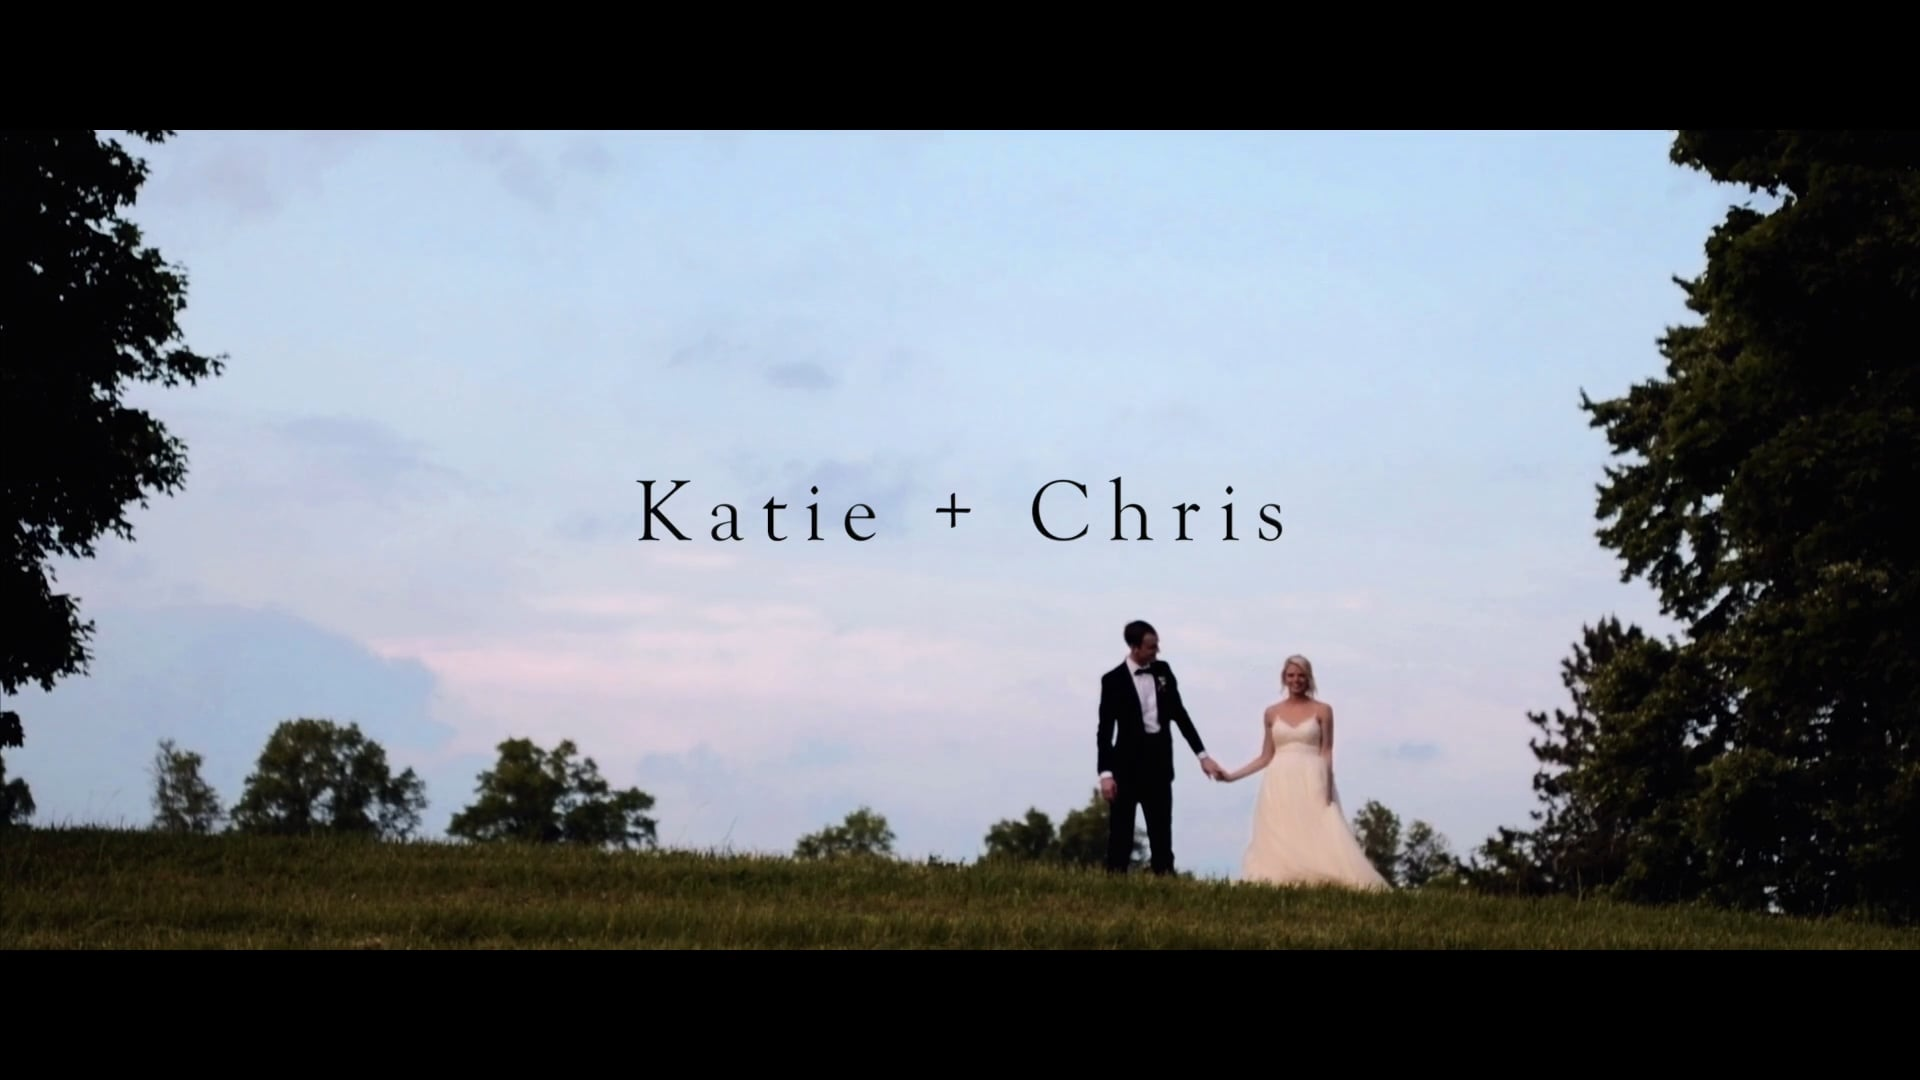 Katie + Chris | A Kentucky Farm Wedding